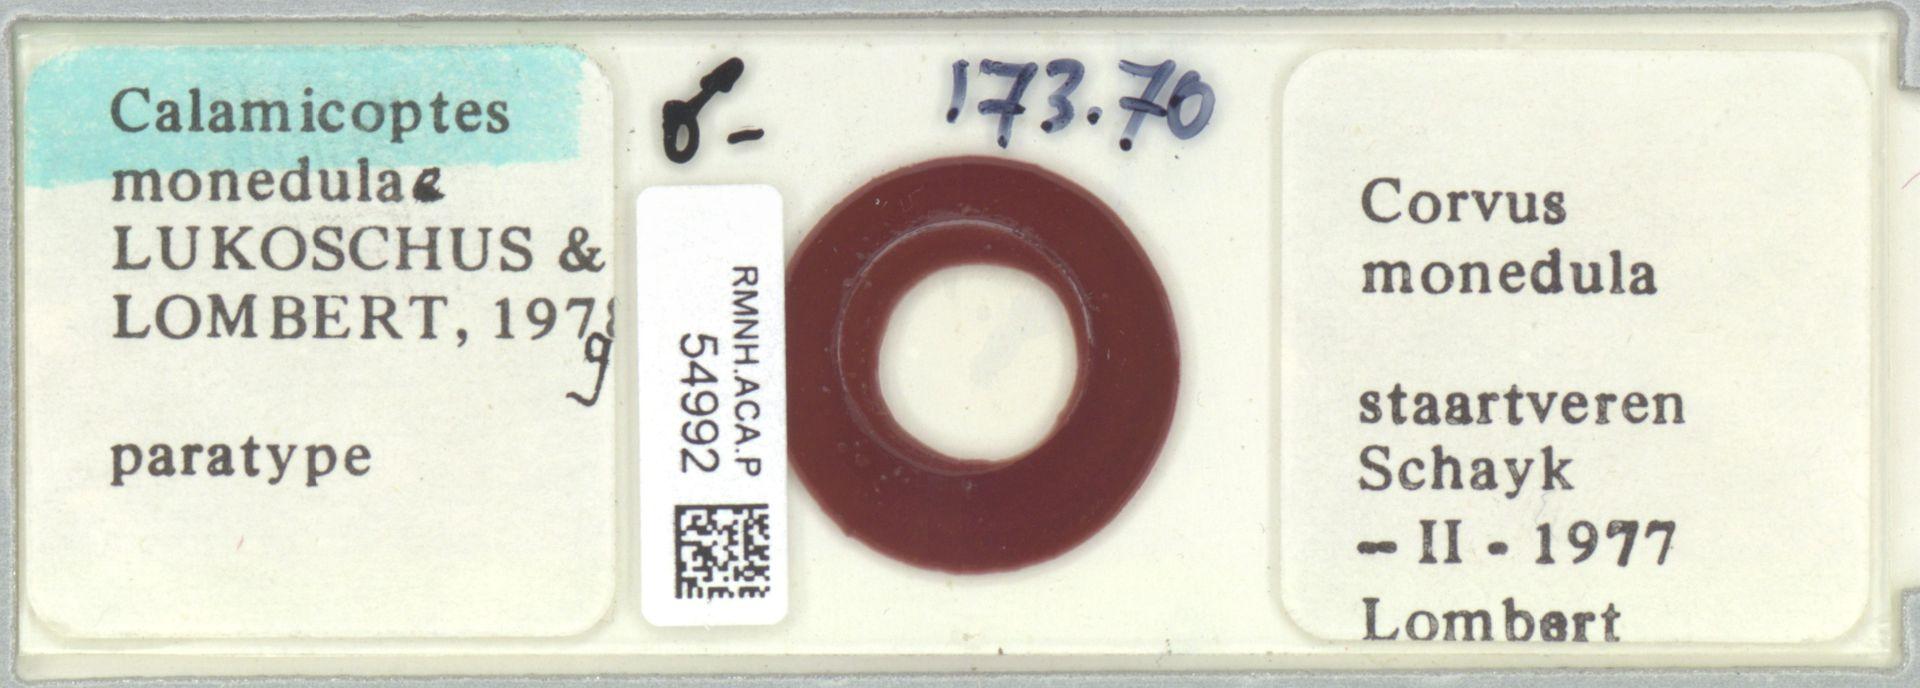 RMNH.ACA.P.54992 | Calamicoptes monedulae Lukoschus & Lombert, 1979